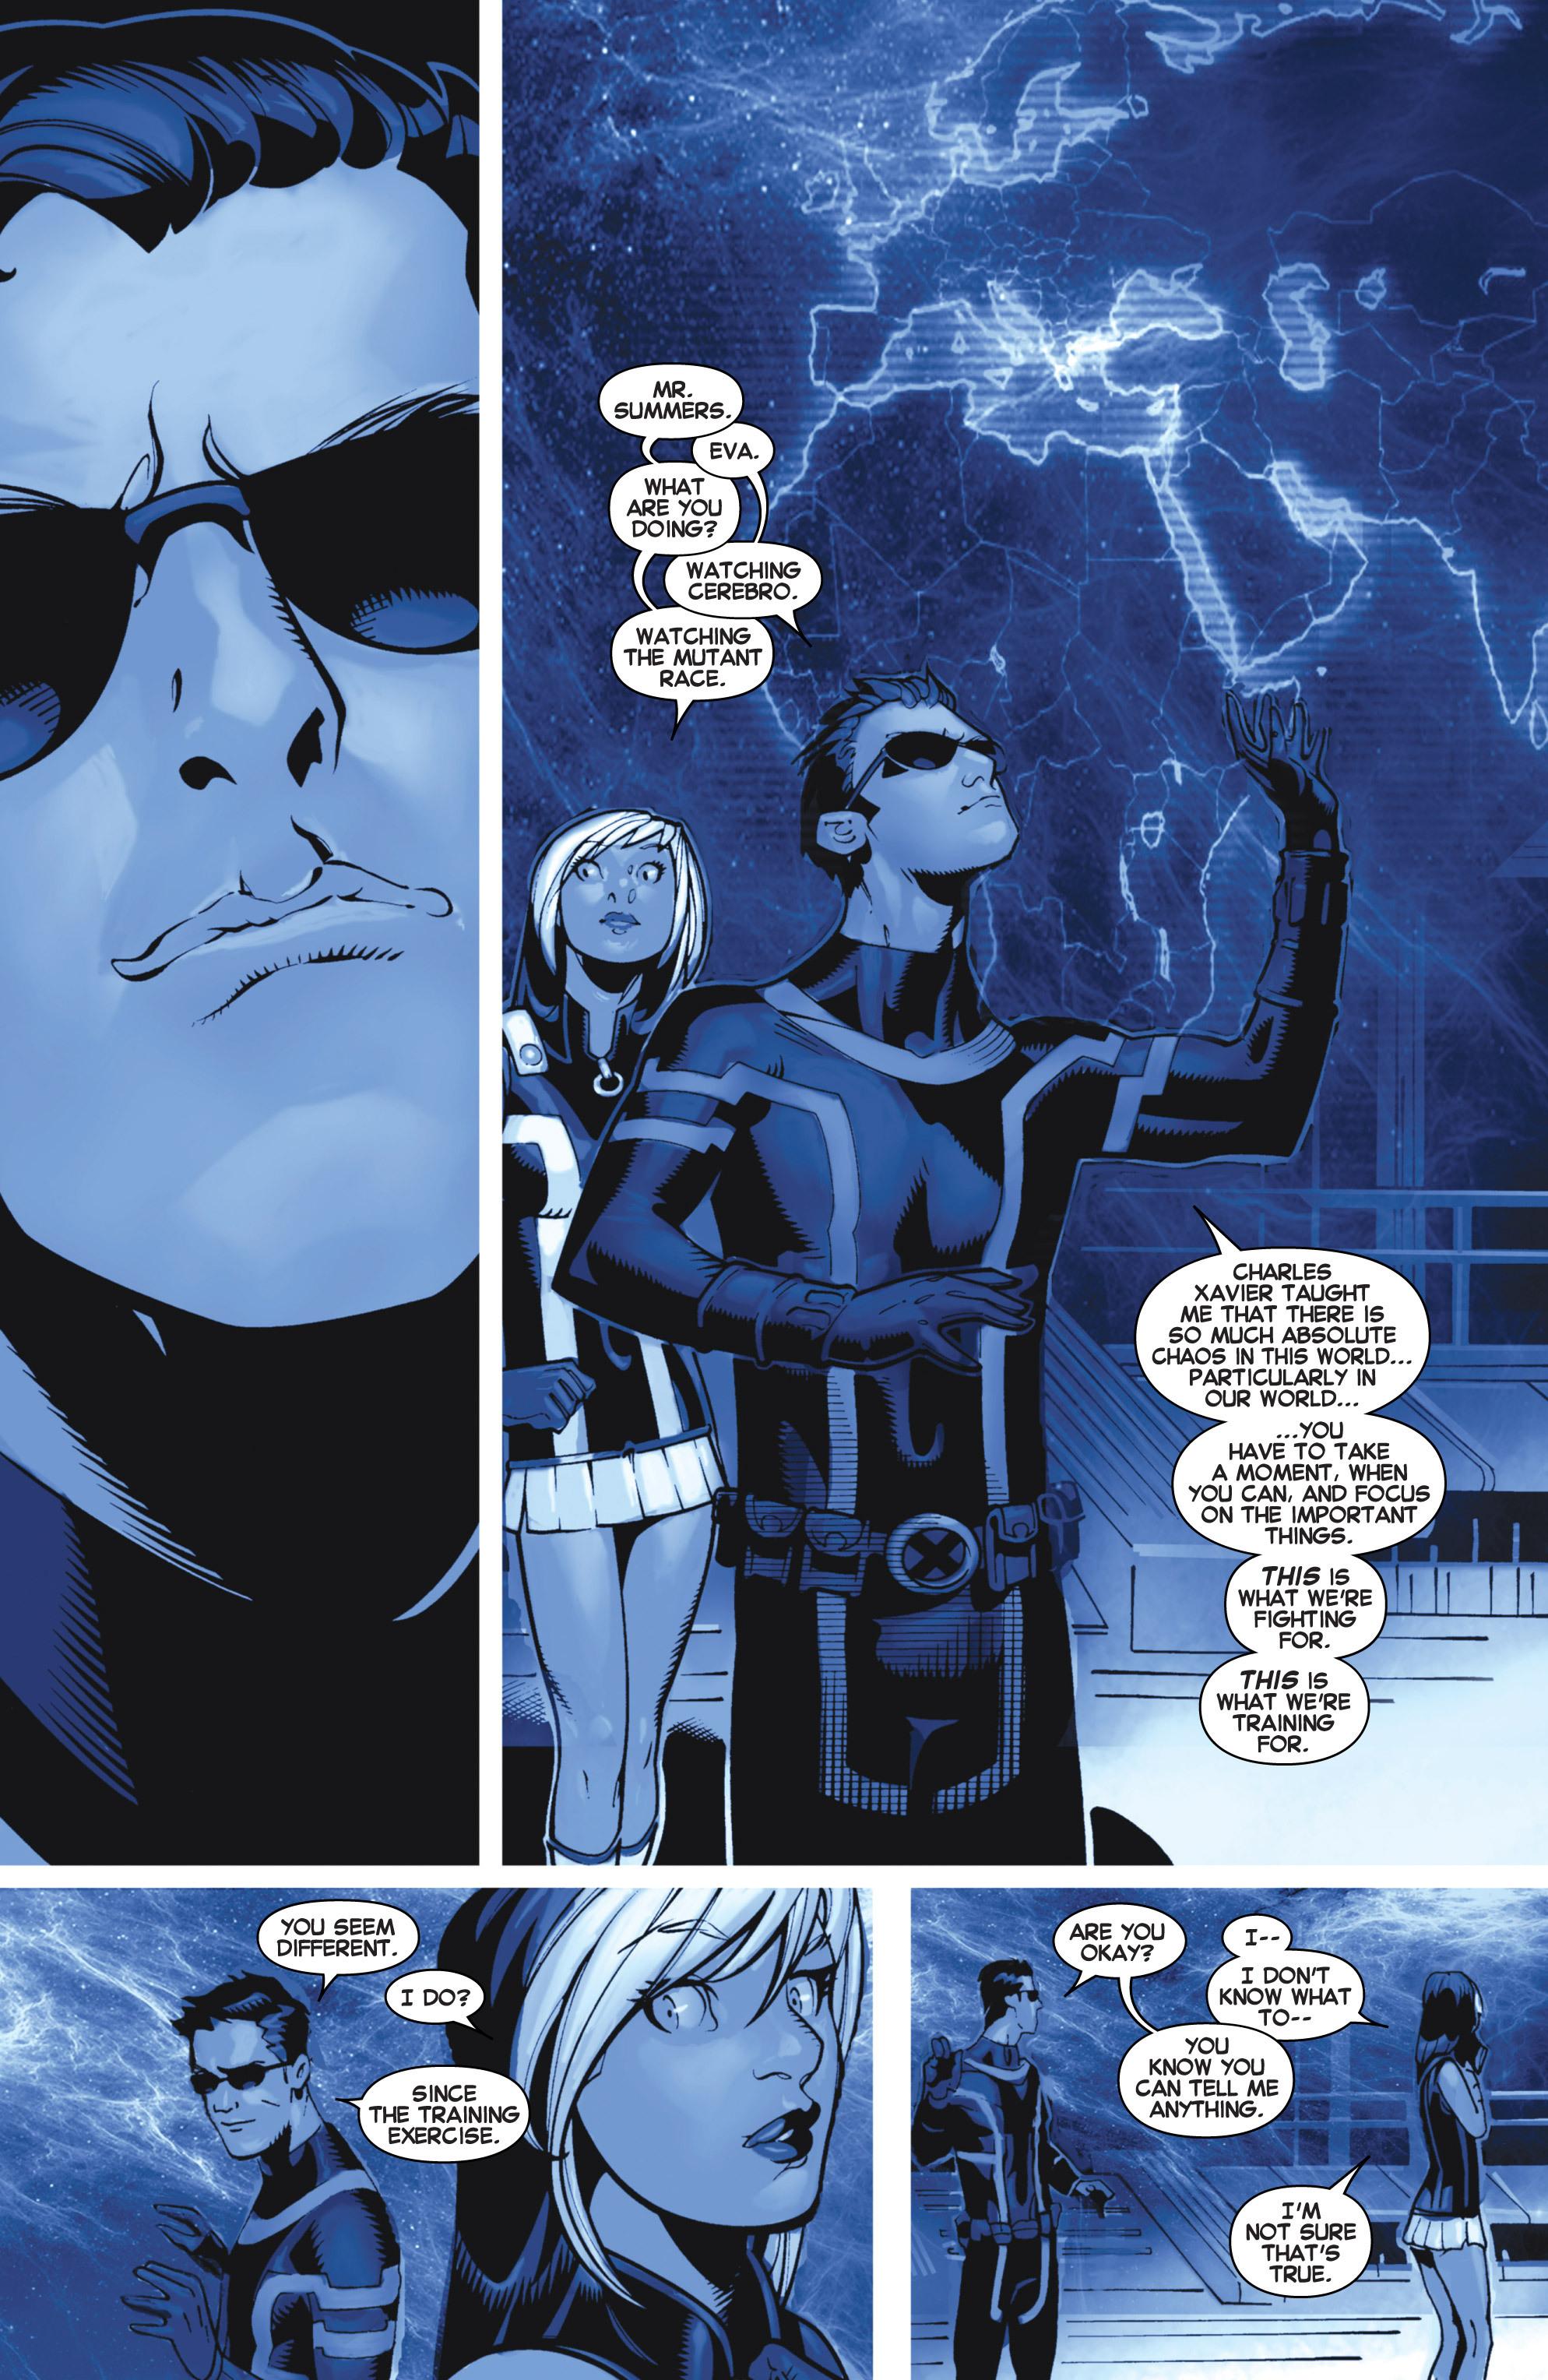 Read online Uncanny X-Men (2013) comic -  Issue # _TPB 4 - vs. S.H.I.E.L.D - 11